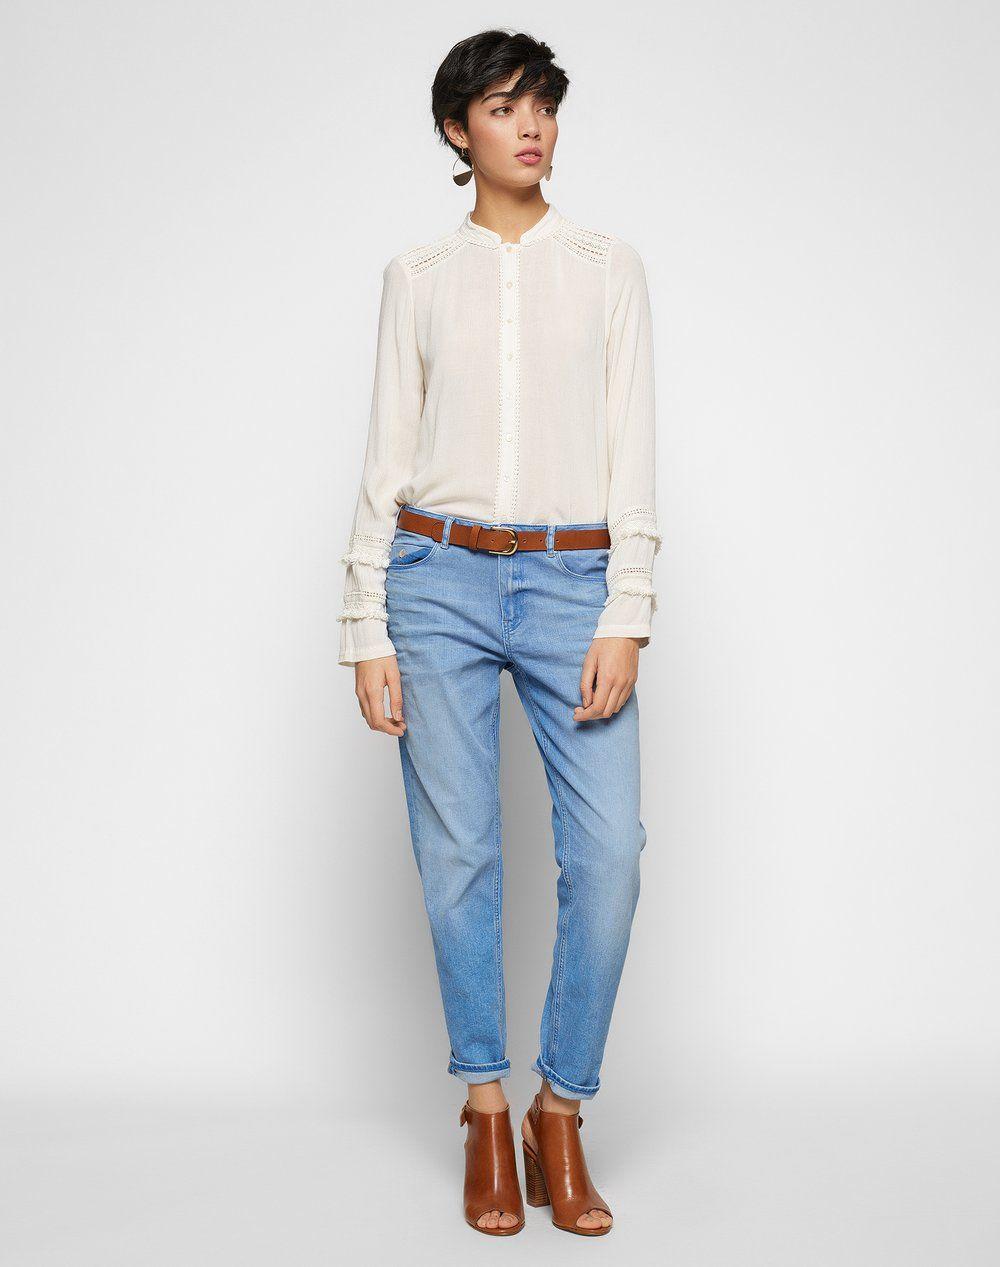 Ausgefallene Damenbekleidung bei EDITED.de bestellen